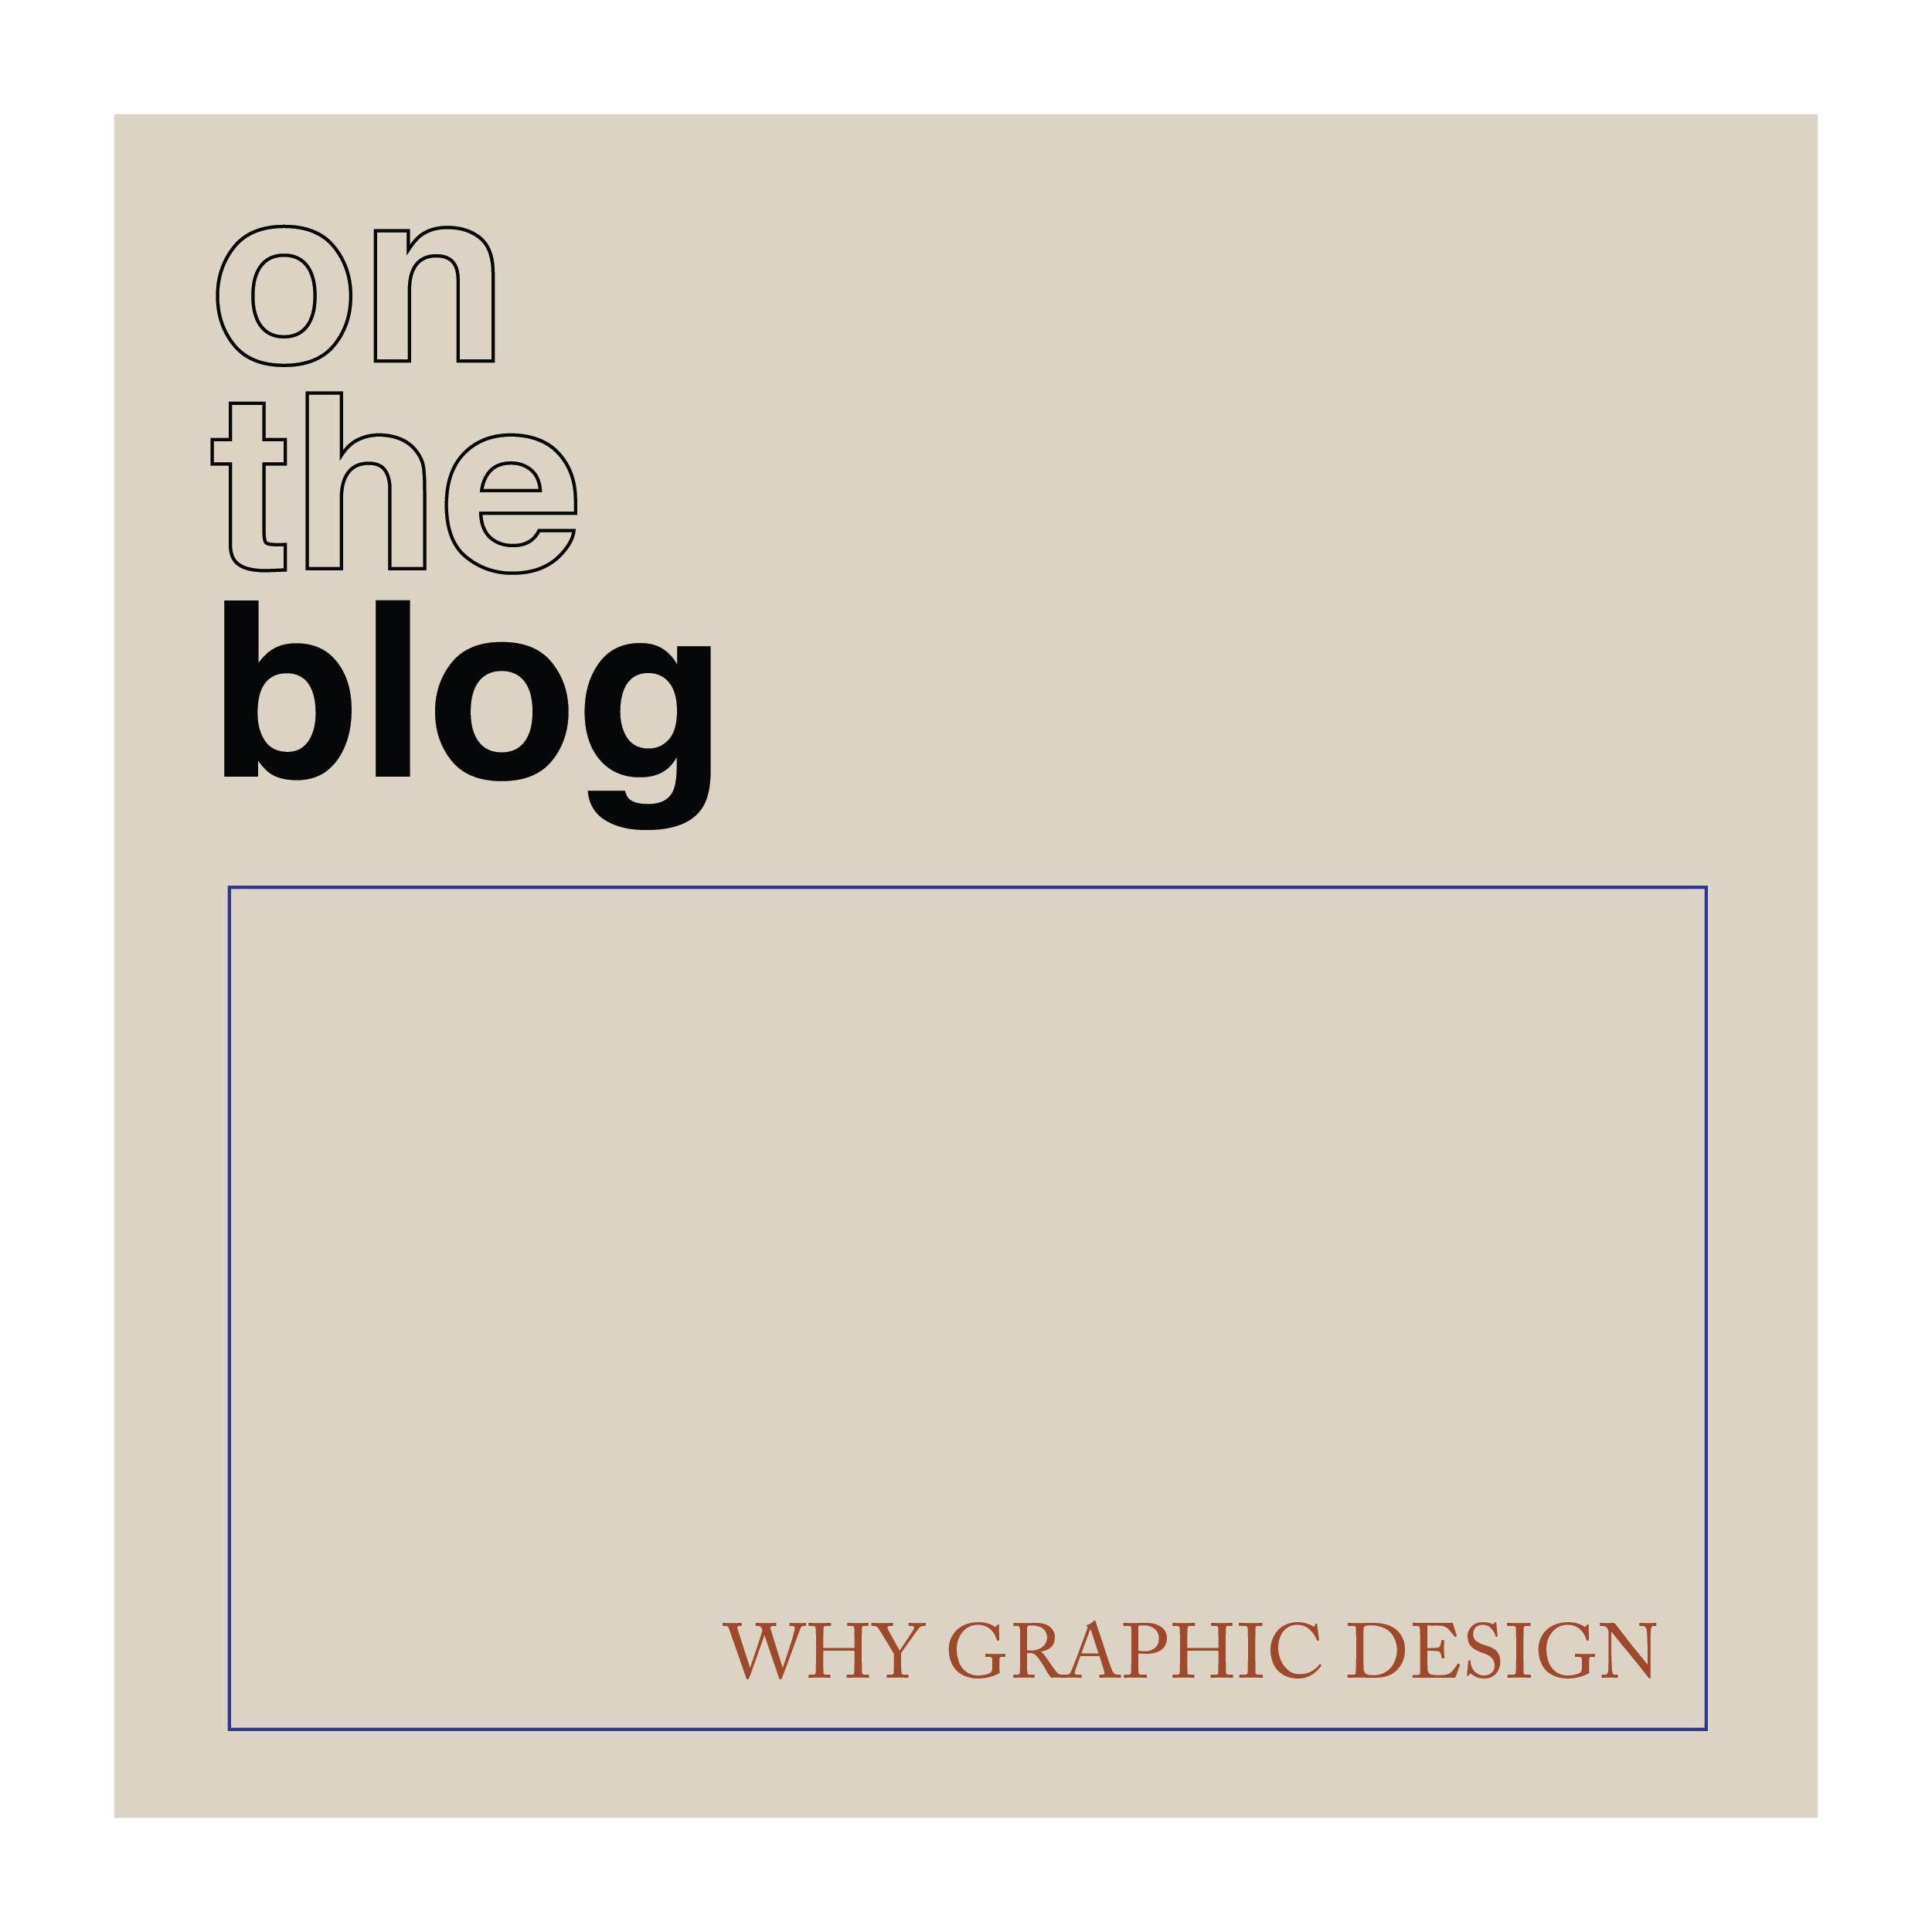 Why I became a graphic designer